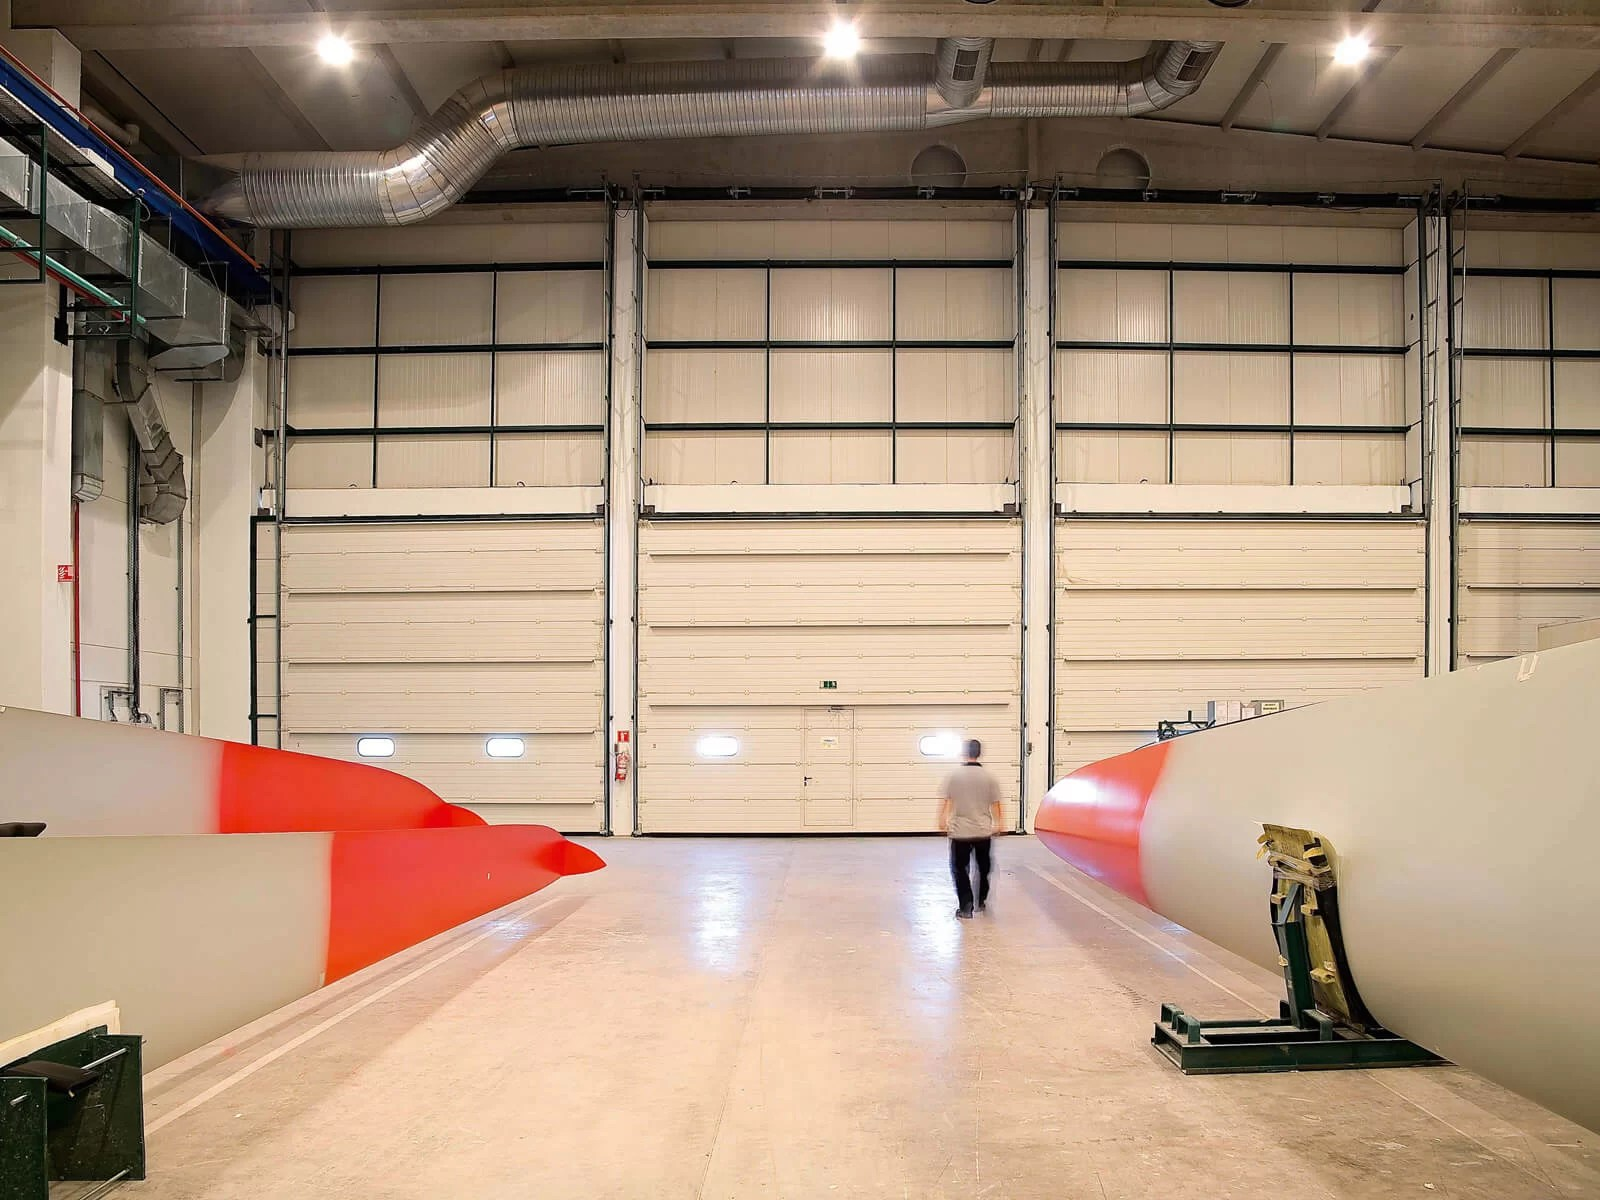 Portone sezionale industriale SECURA - Stucco bianco C21 vista interna